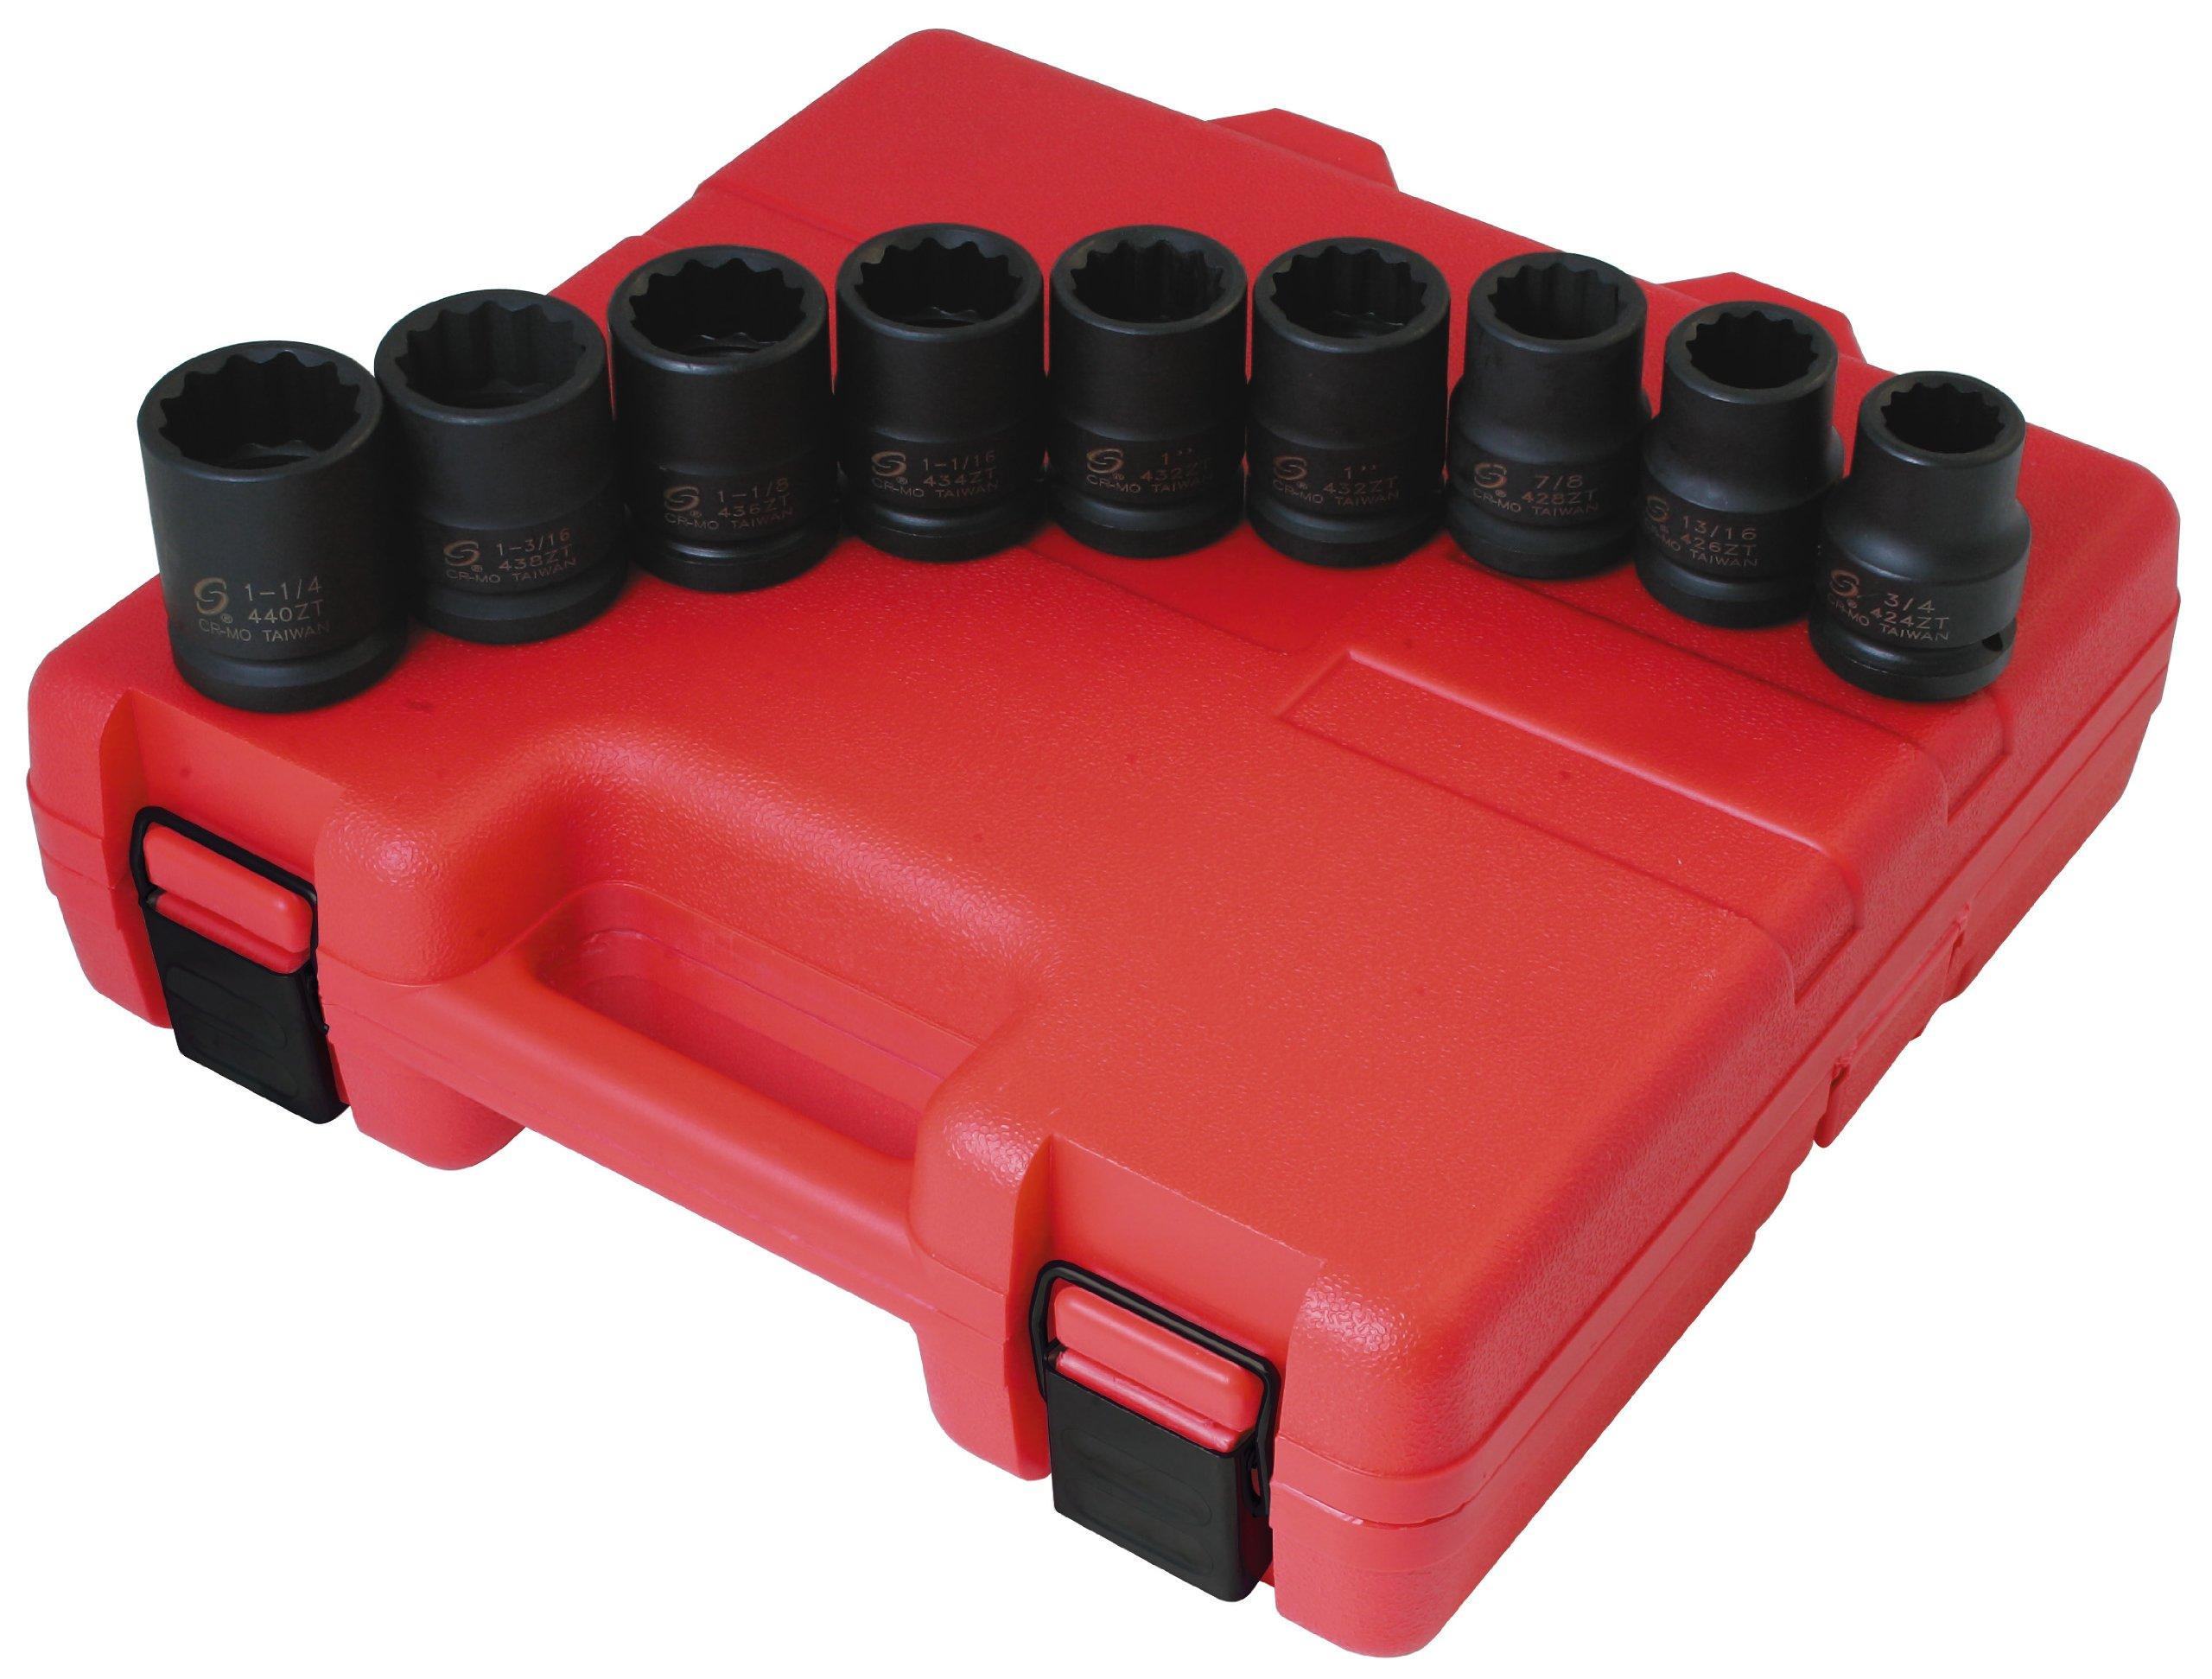 Sunex 4687 3/4-Inch Drive 12-Point SAE Impact Socket Set, 9-Piece